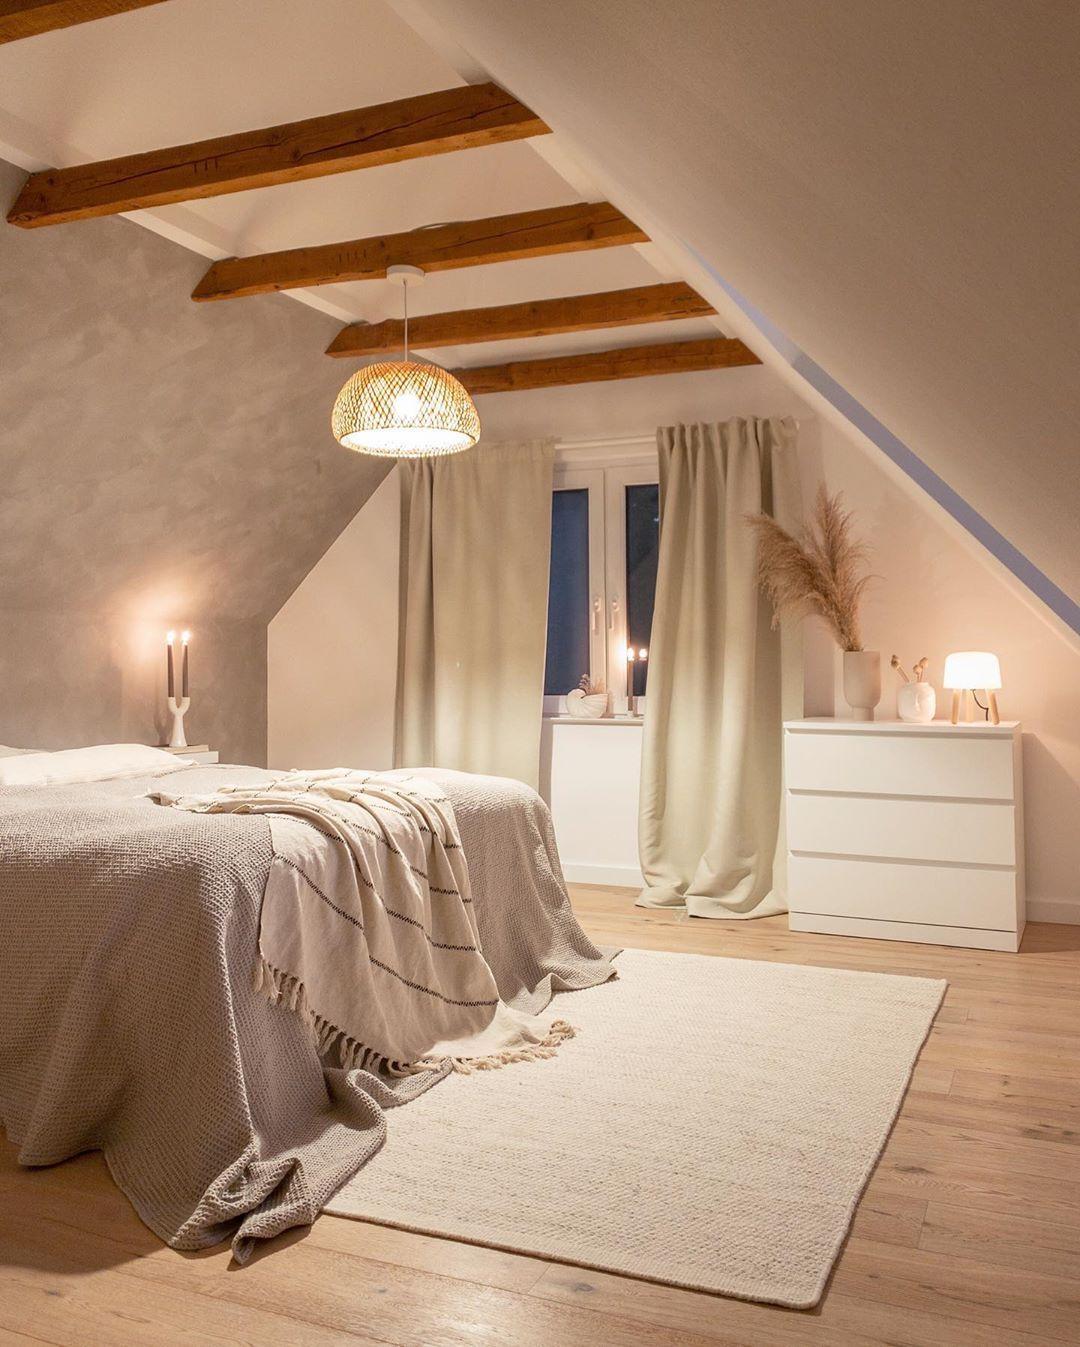 bettvorleger im skandinavischen stil | apartment bedroom